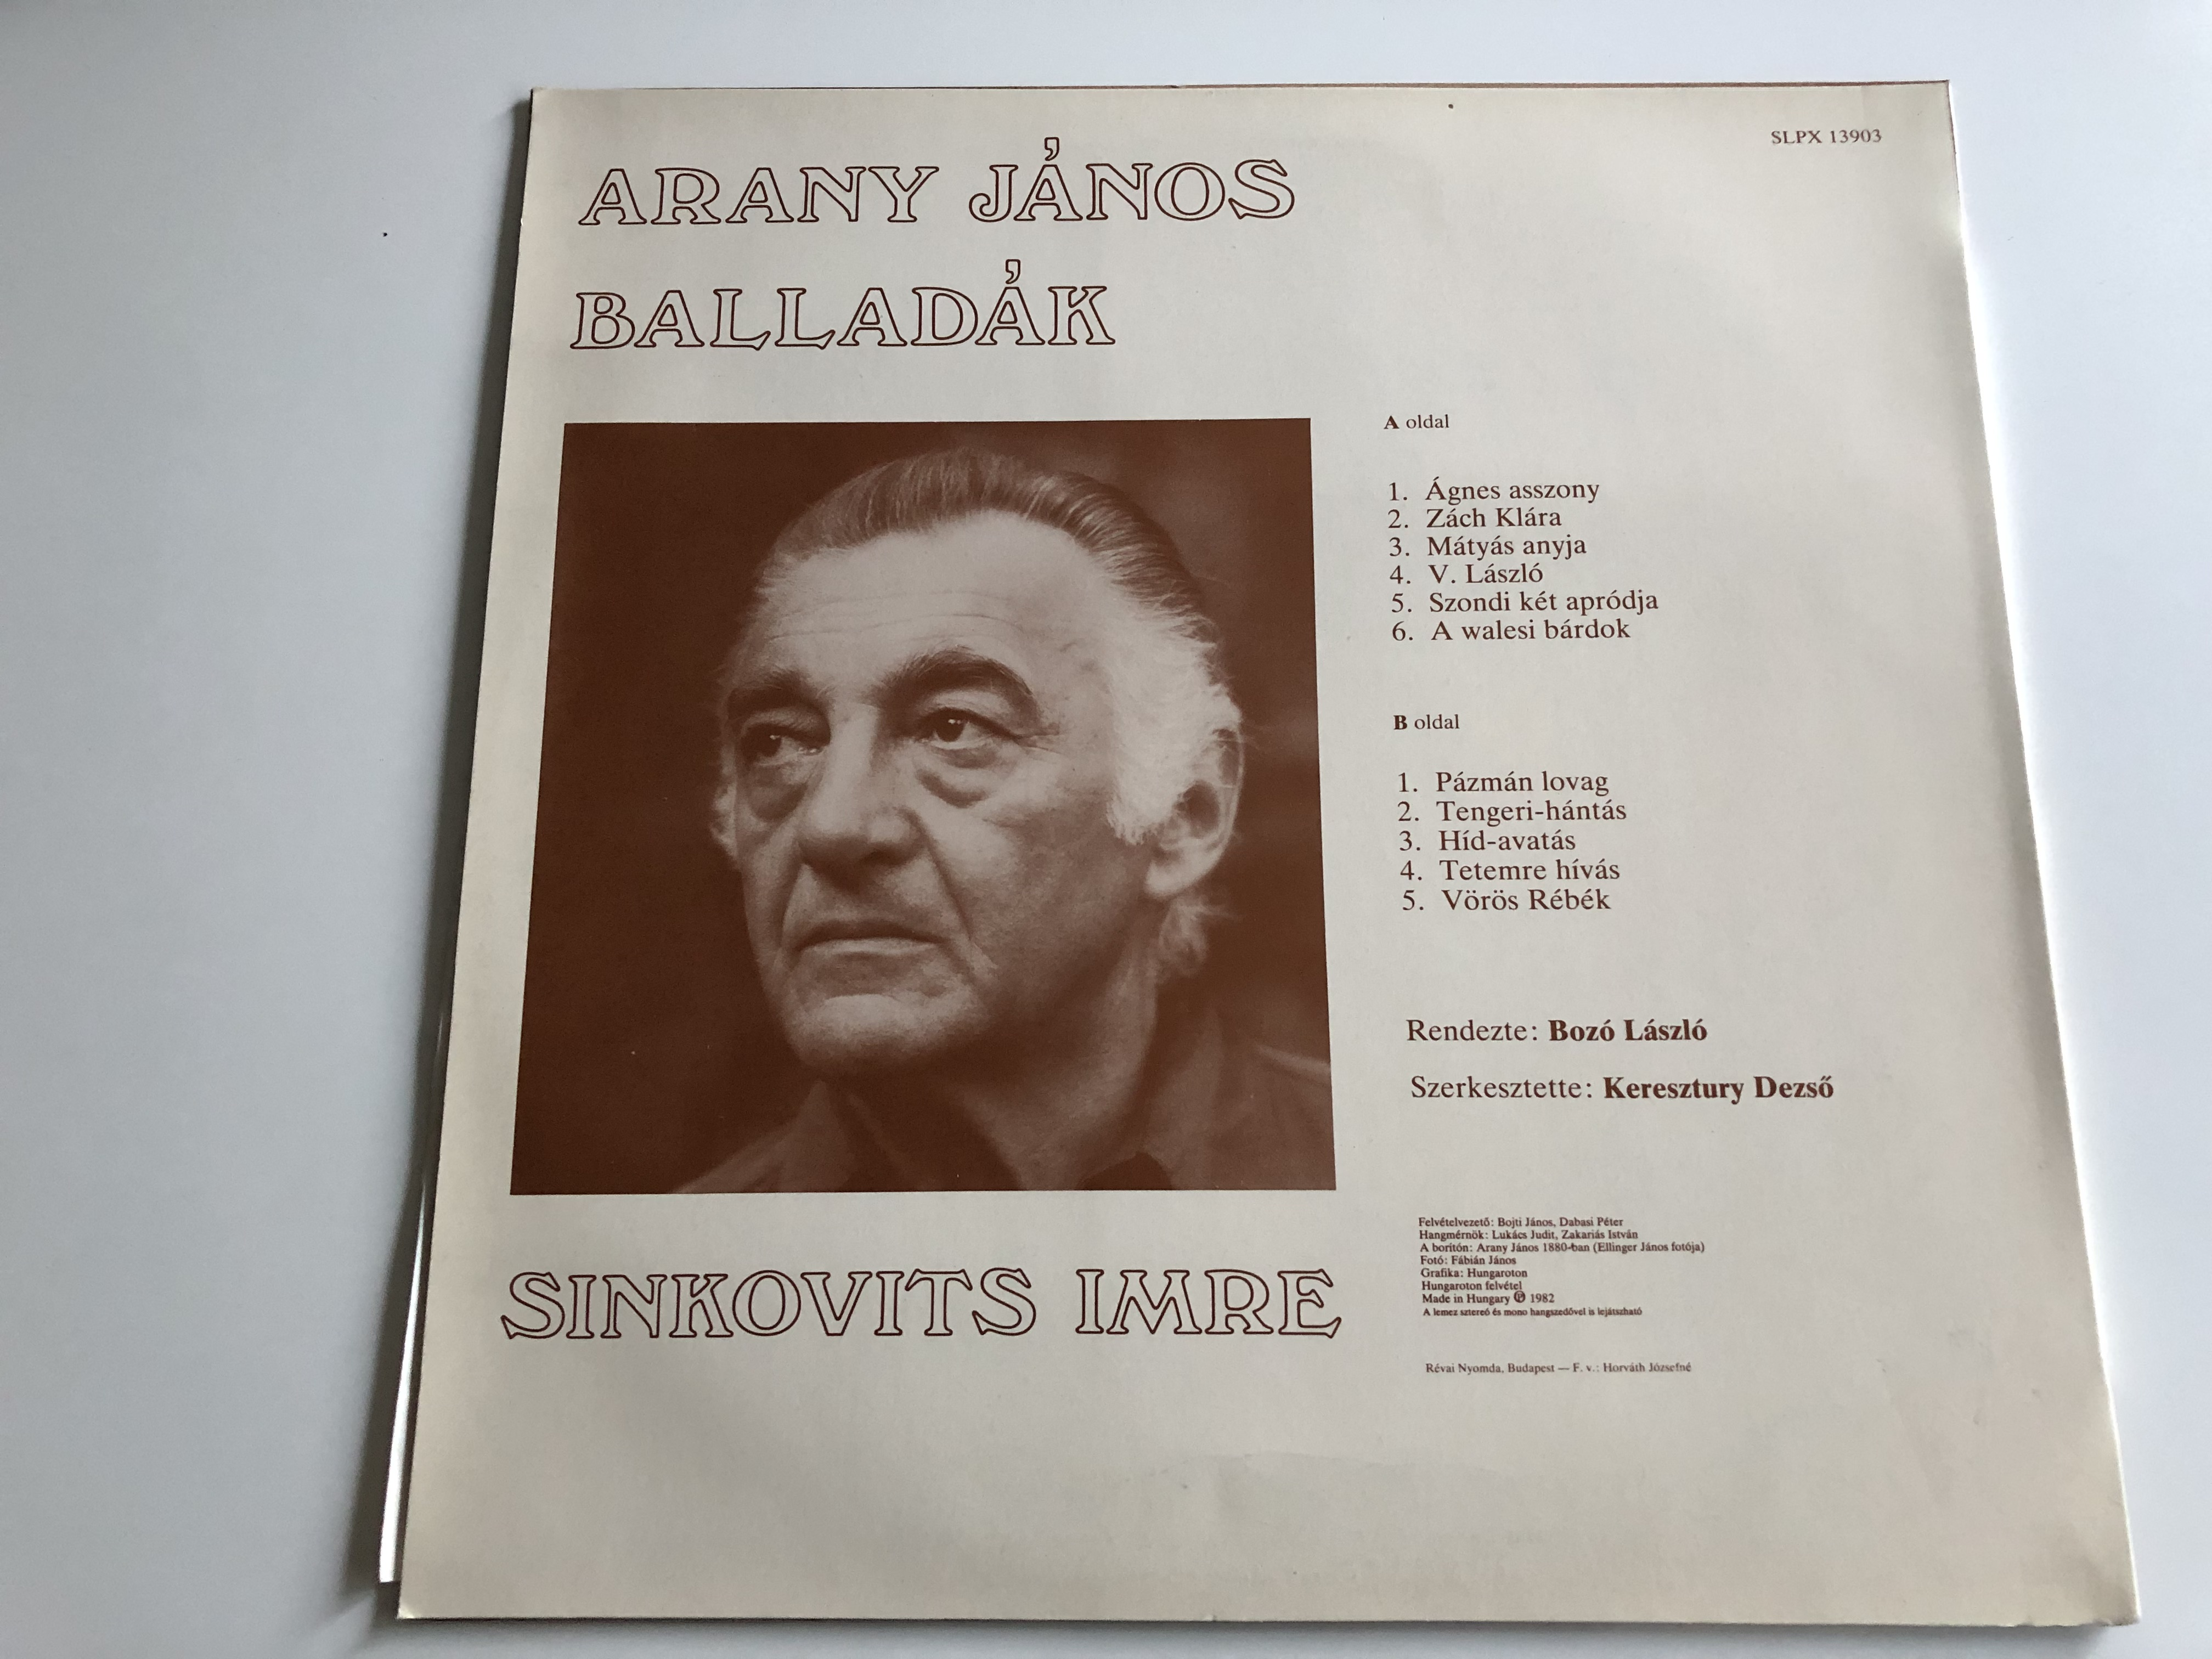 arany-j-nos-ballad-k-sinkovits-imre-hungaroton-lp-stereo-slpx-13903-2-.jpg